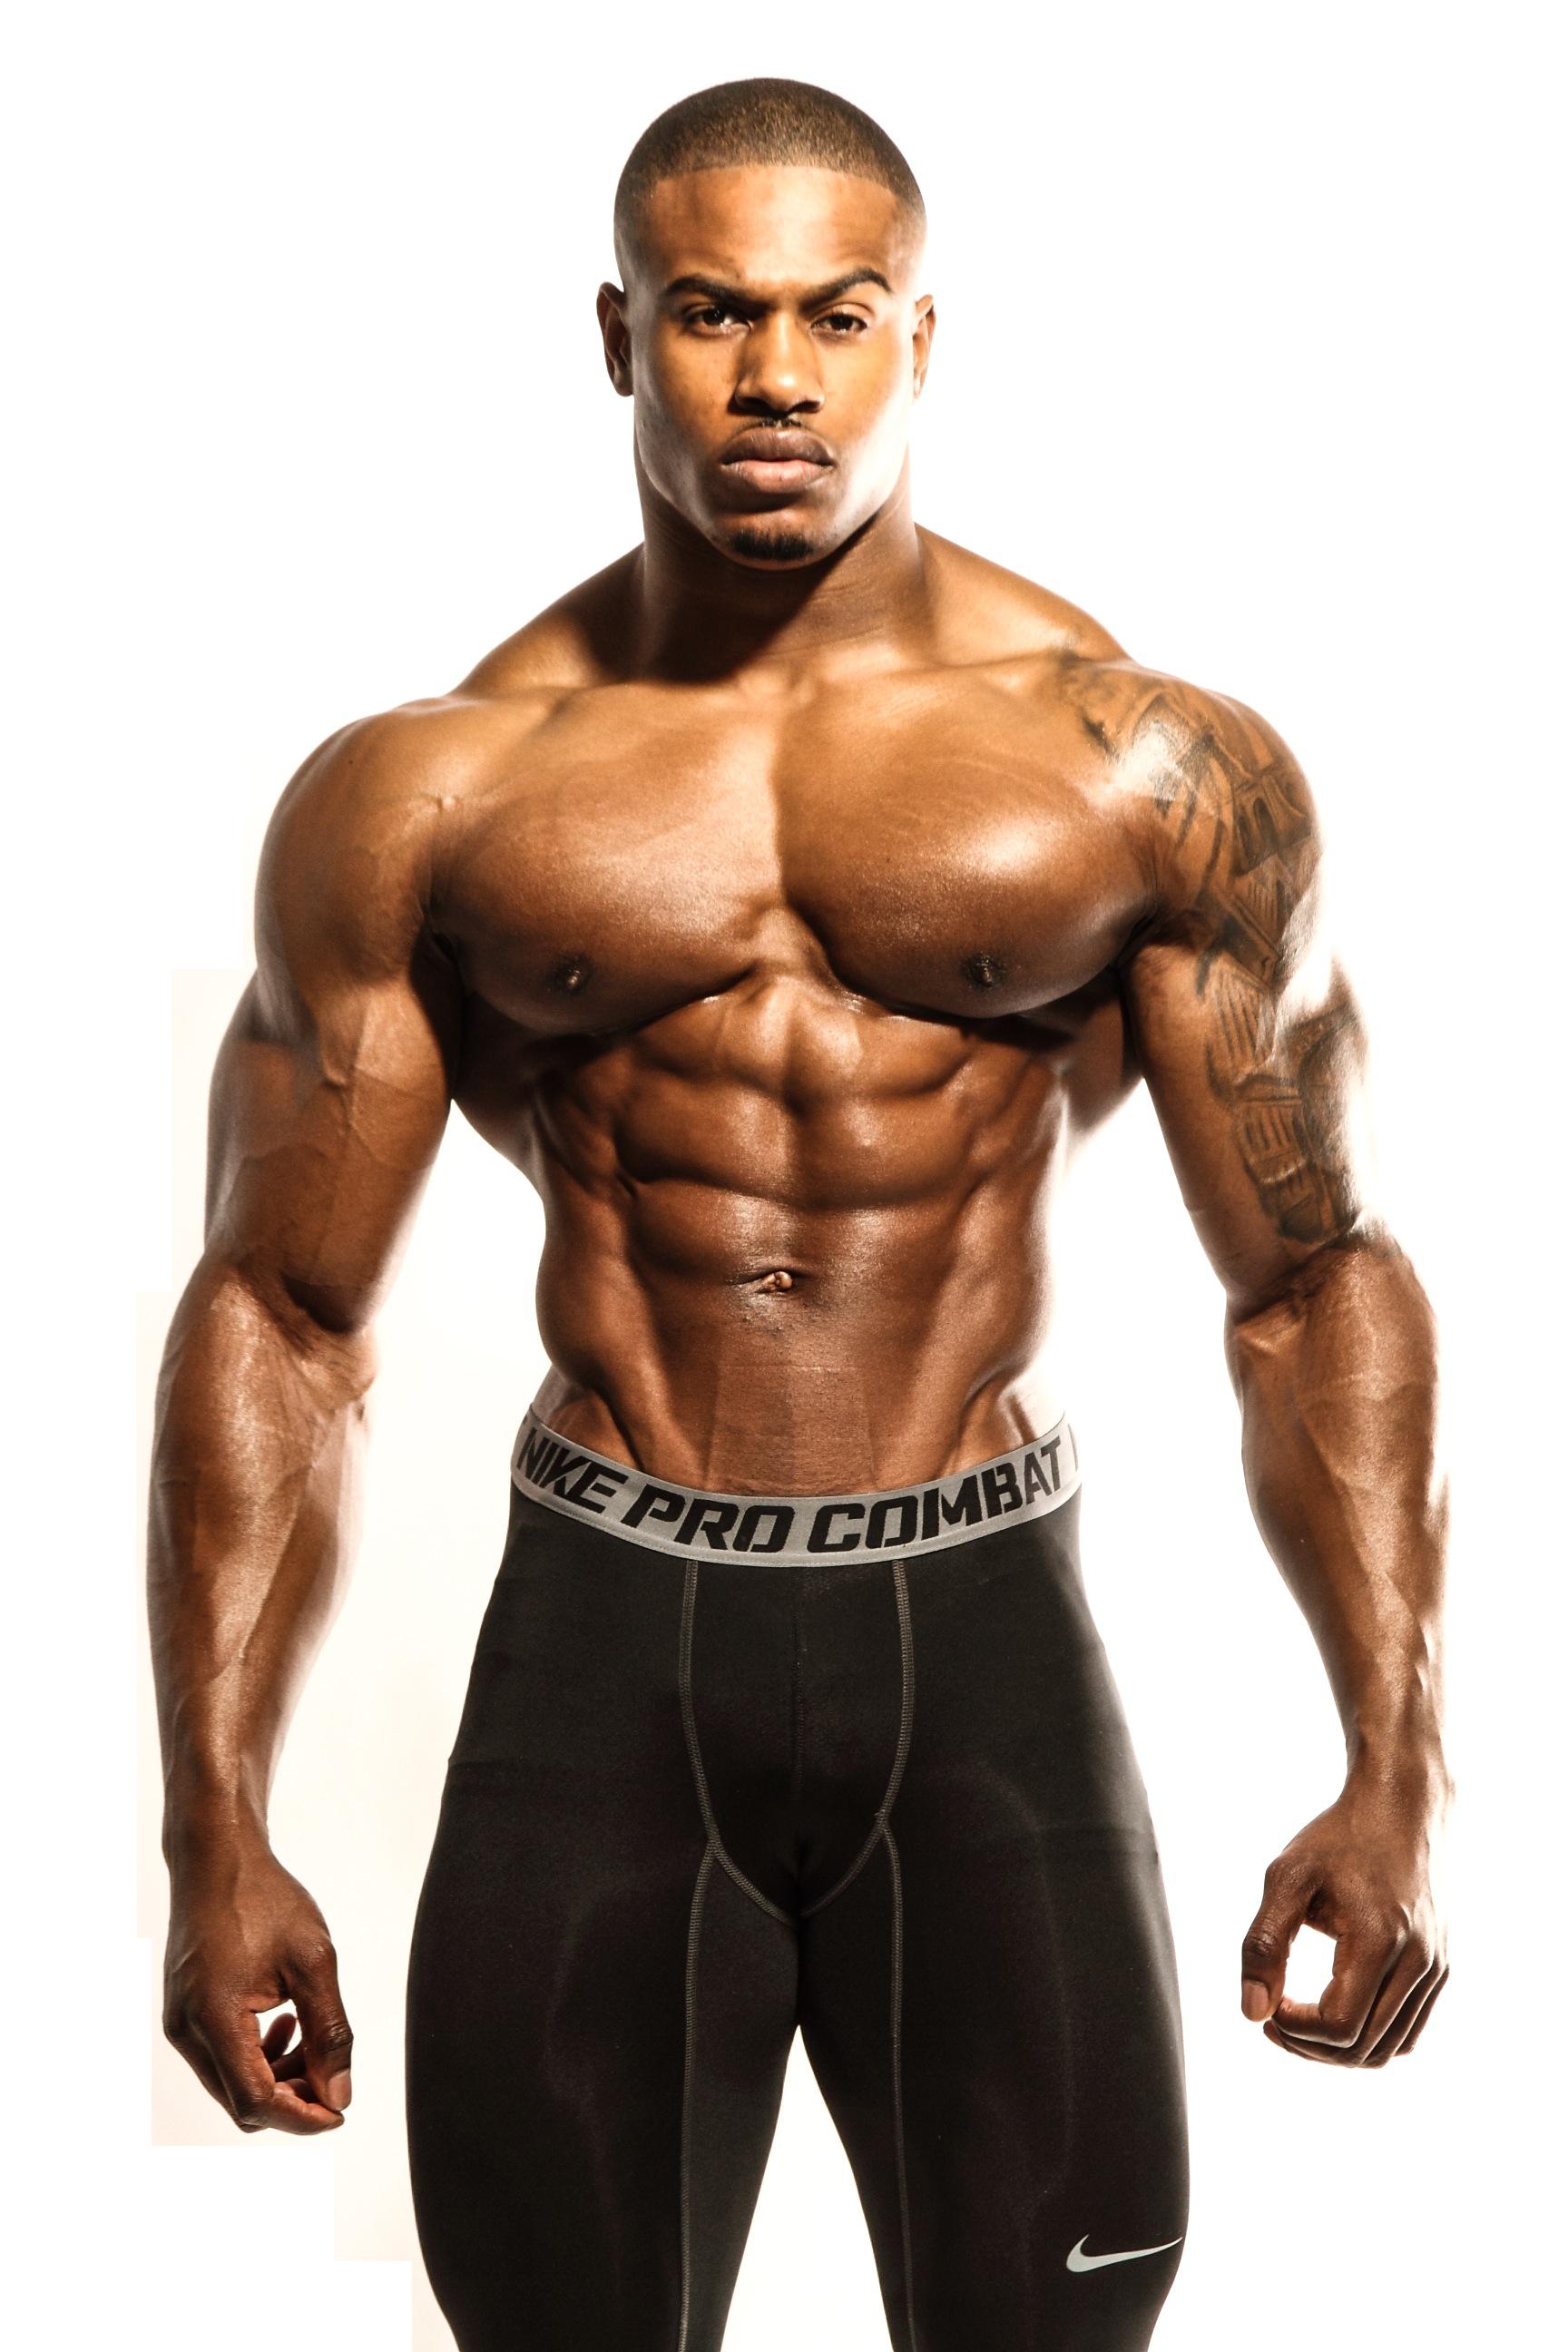 Bodybuilding PNG Images Transparent Free Download.